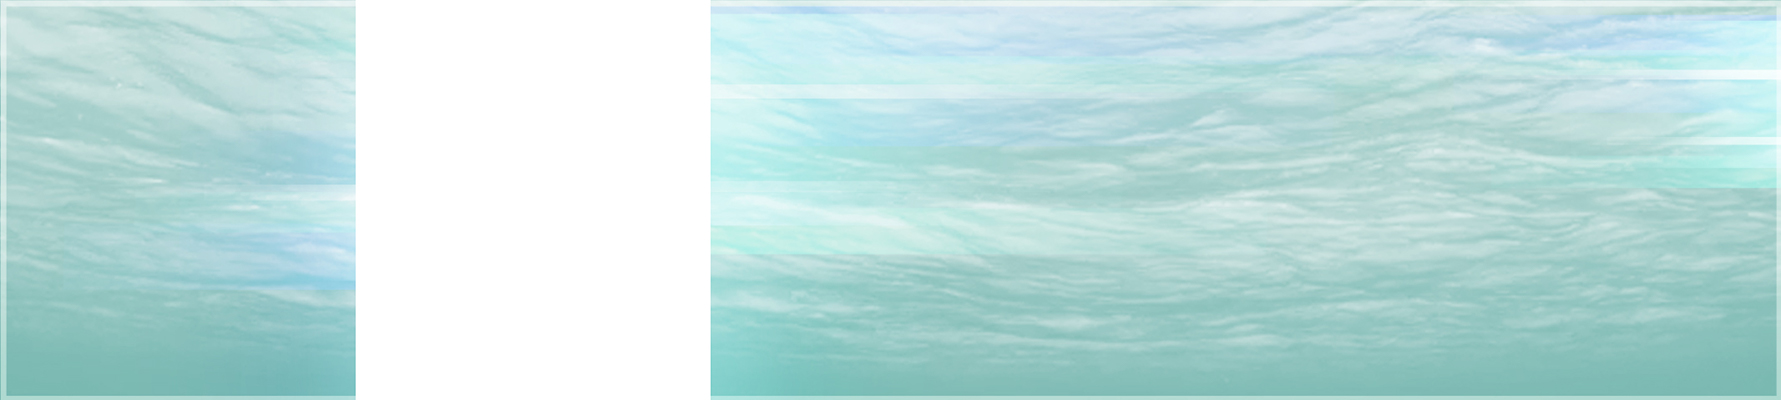 Water_Horizontal